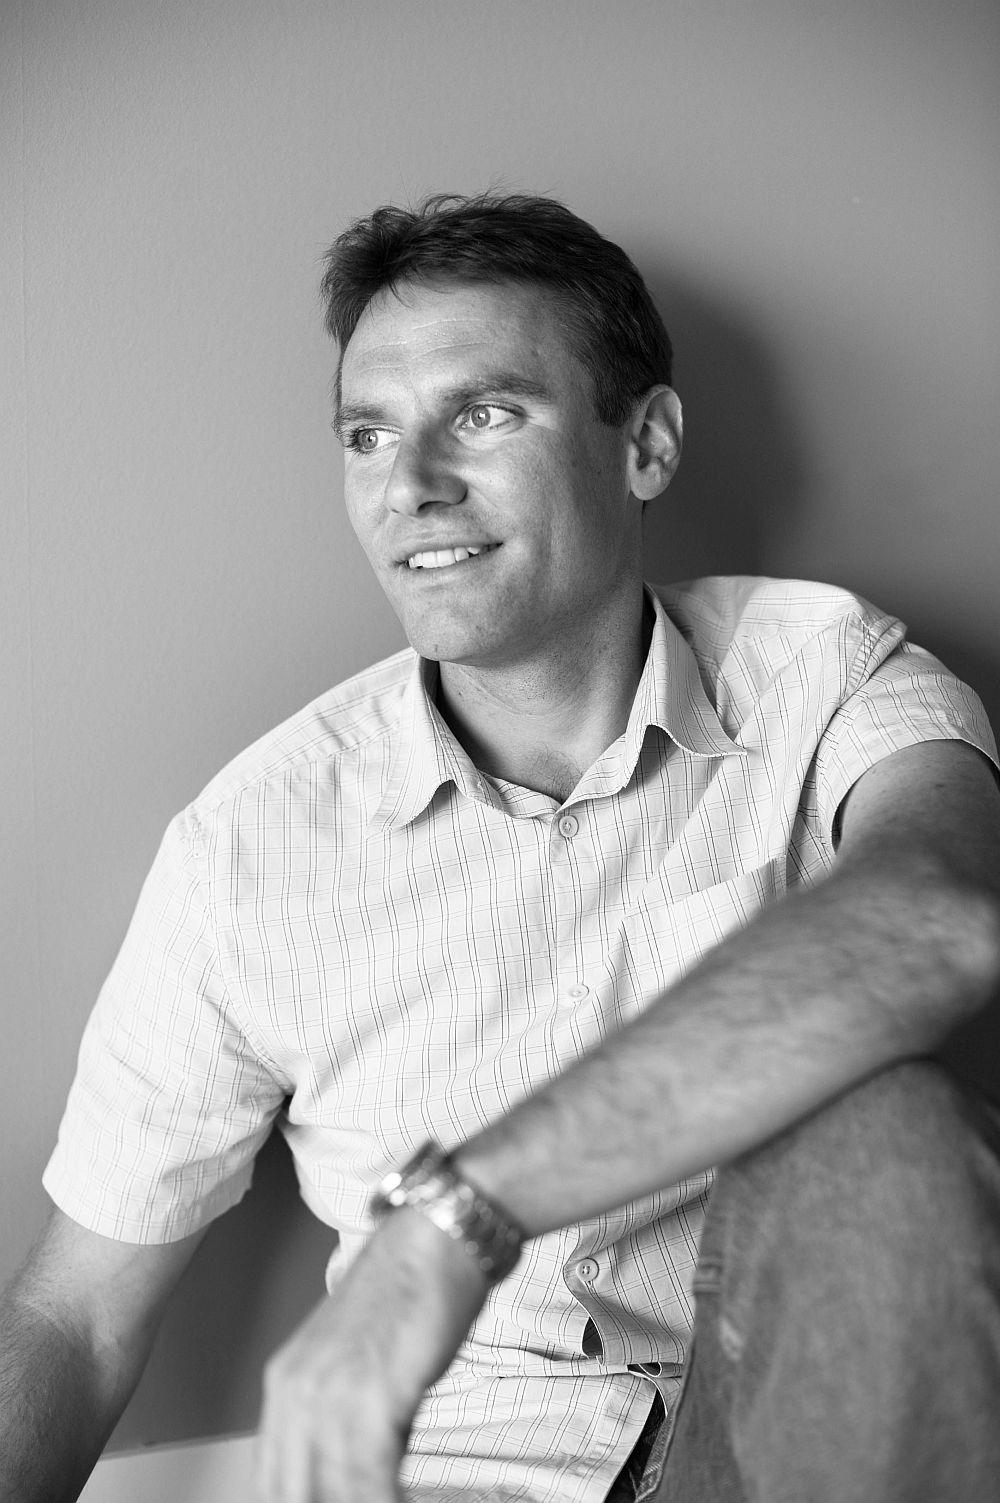 James From Katikati, New Zealand